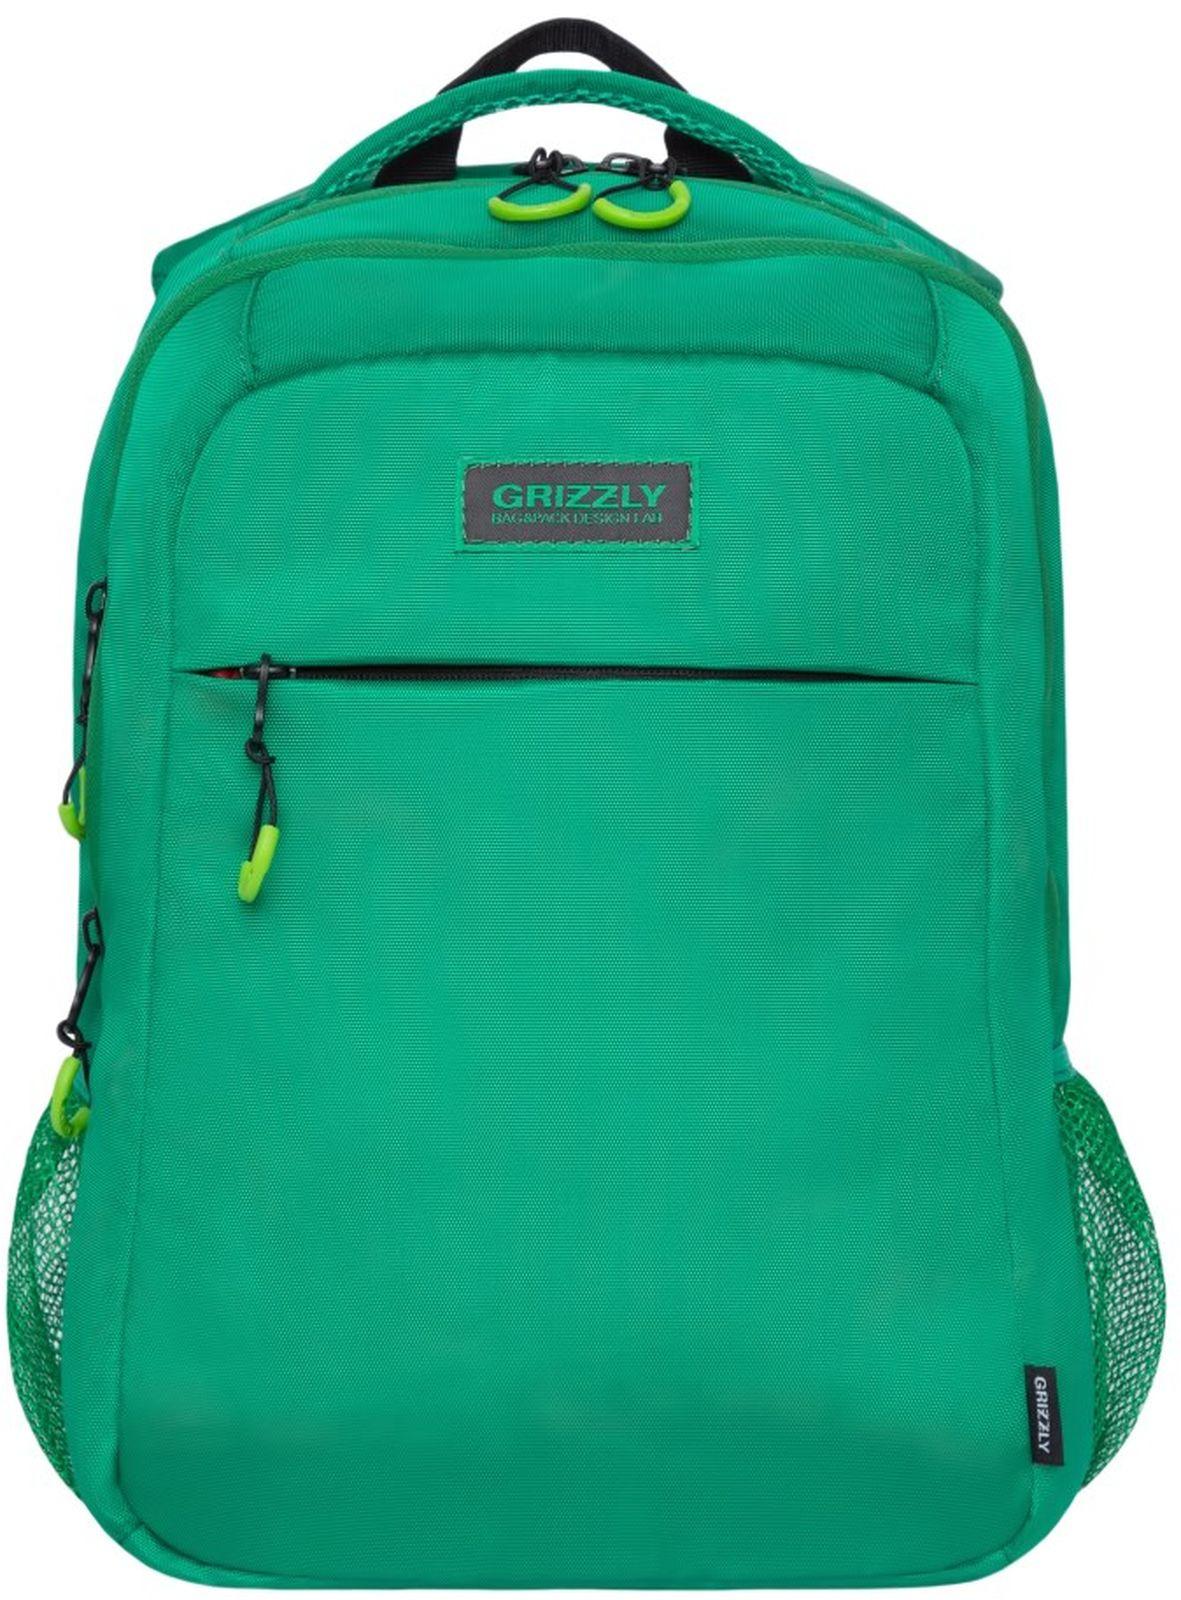 Рюкзак Grizzly, RU-933-2/3, зеленый рюкзак grizzly ru 804 3 2 black lime green